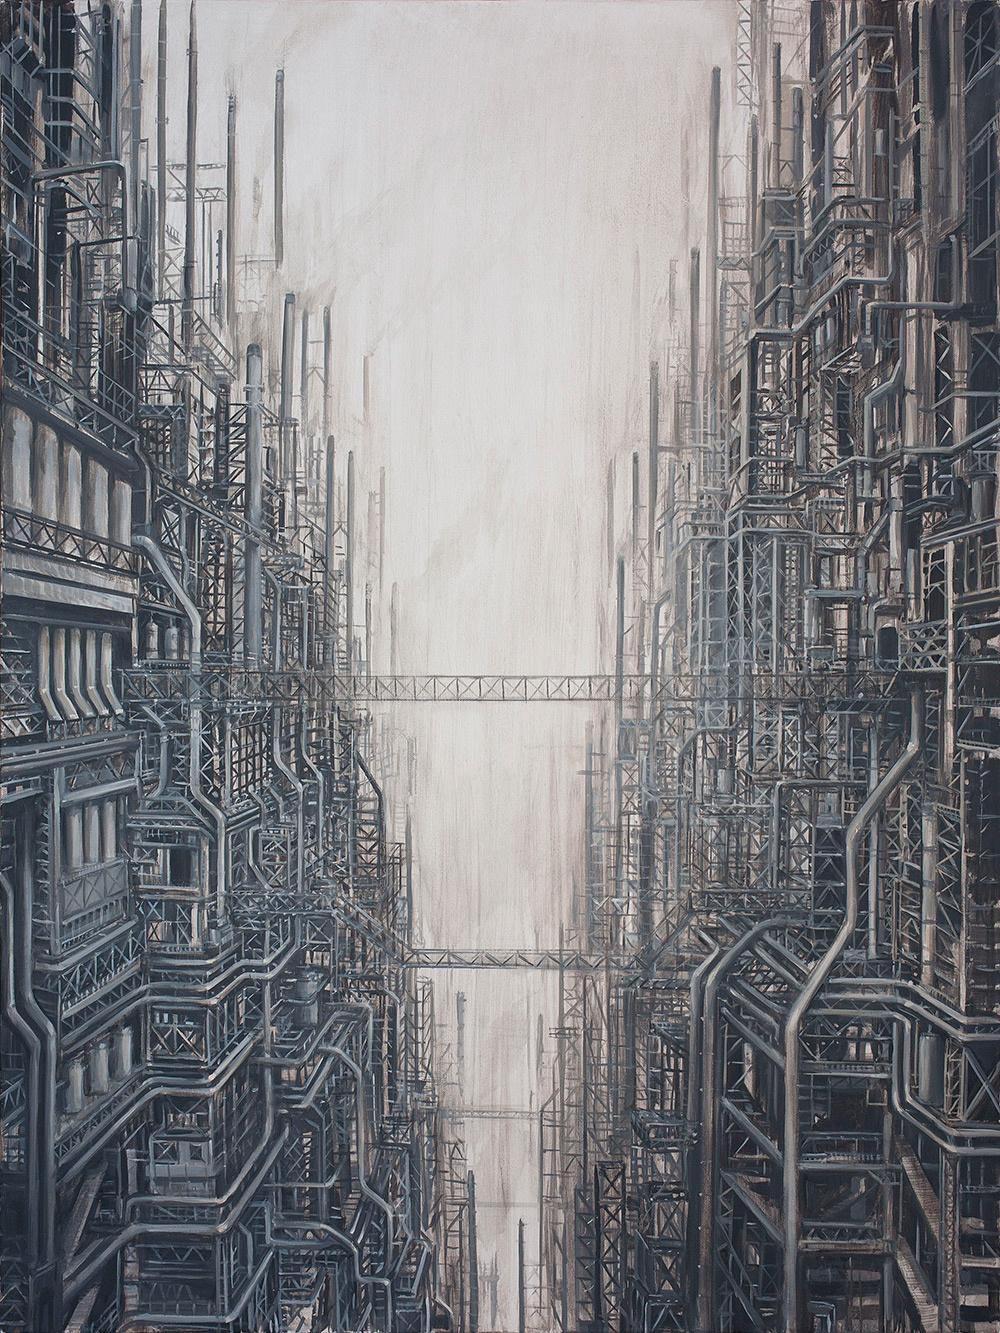 An Artist Visualizes The Terrifying, Dystopian Metropolises Of Tomorrow